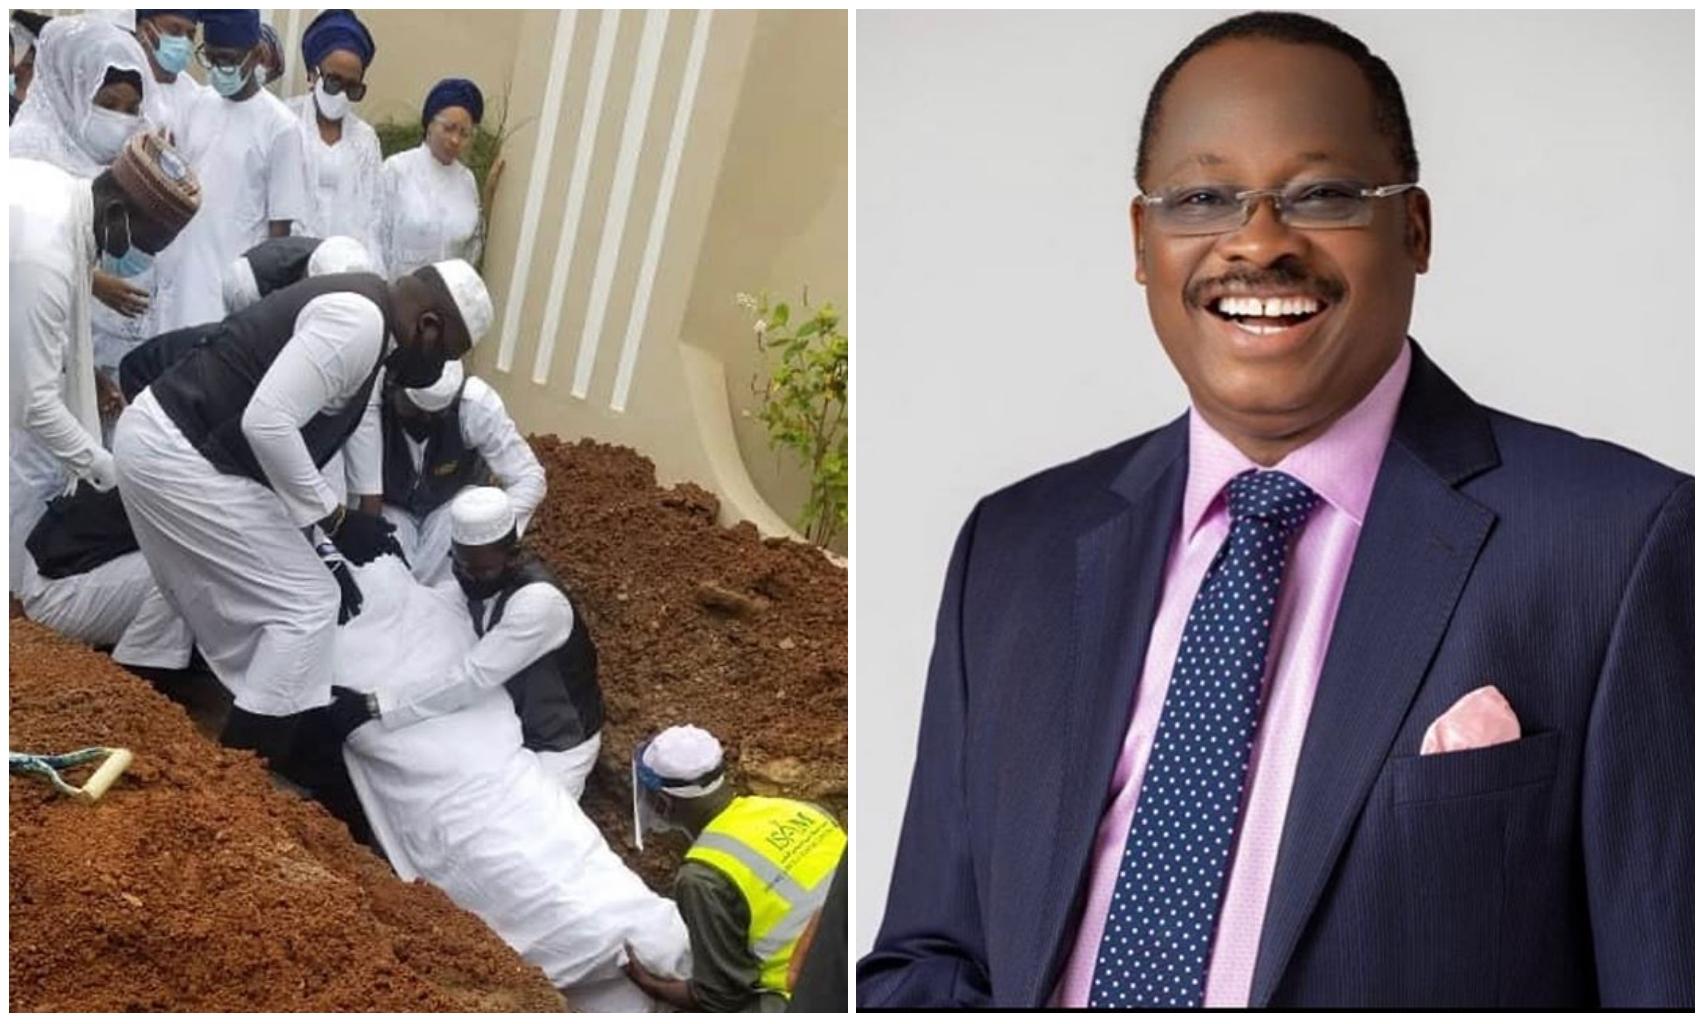 'Constituted authority RIP' – Nigerians reacts to Abiola Ajimobi's burial (Photos)